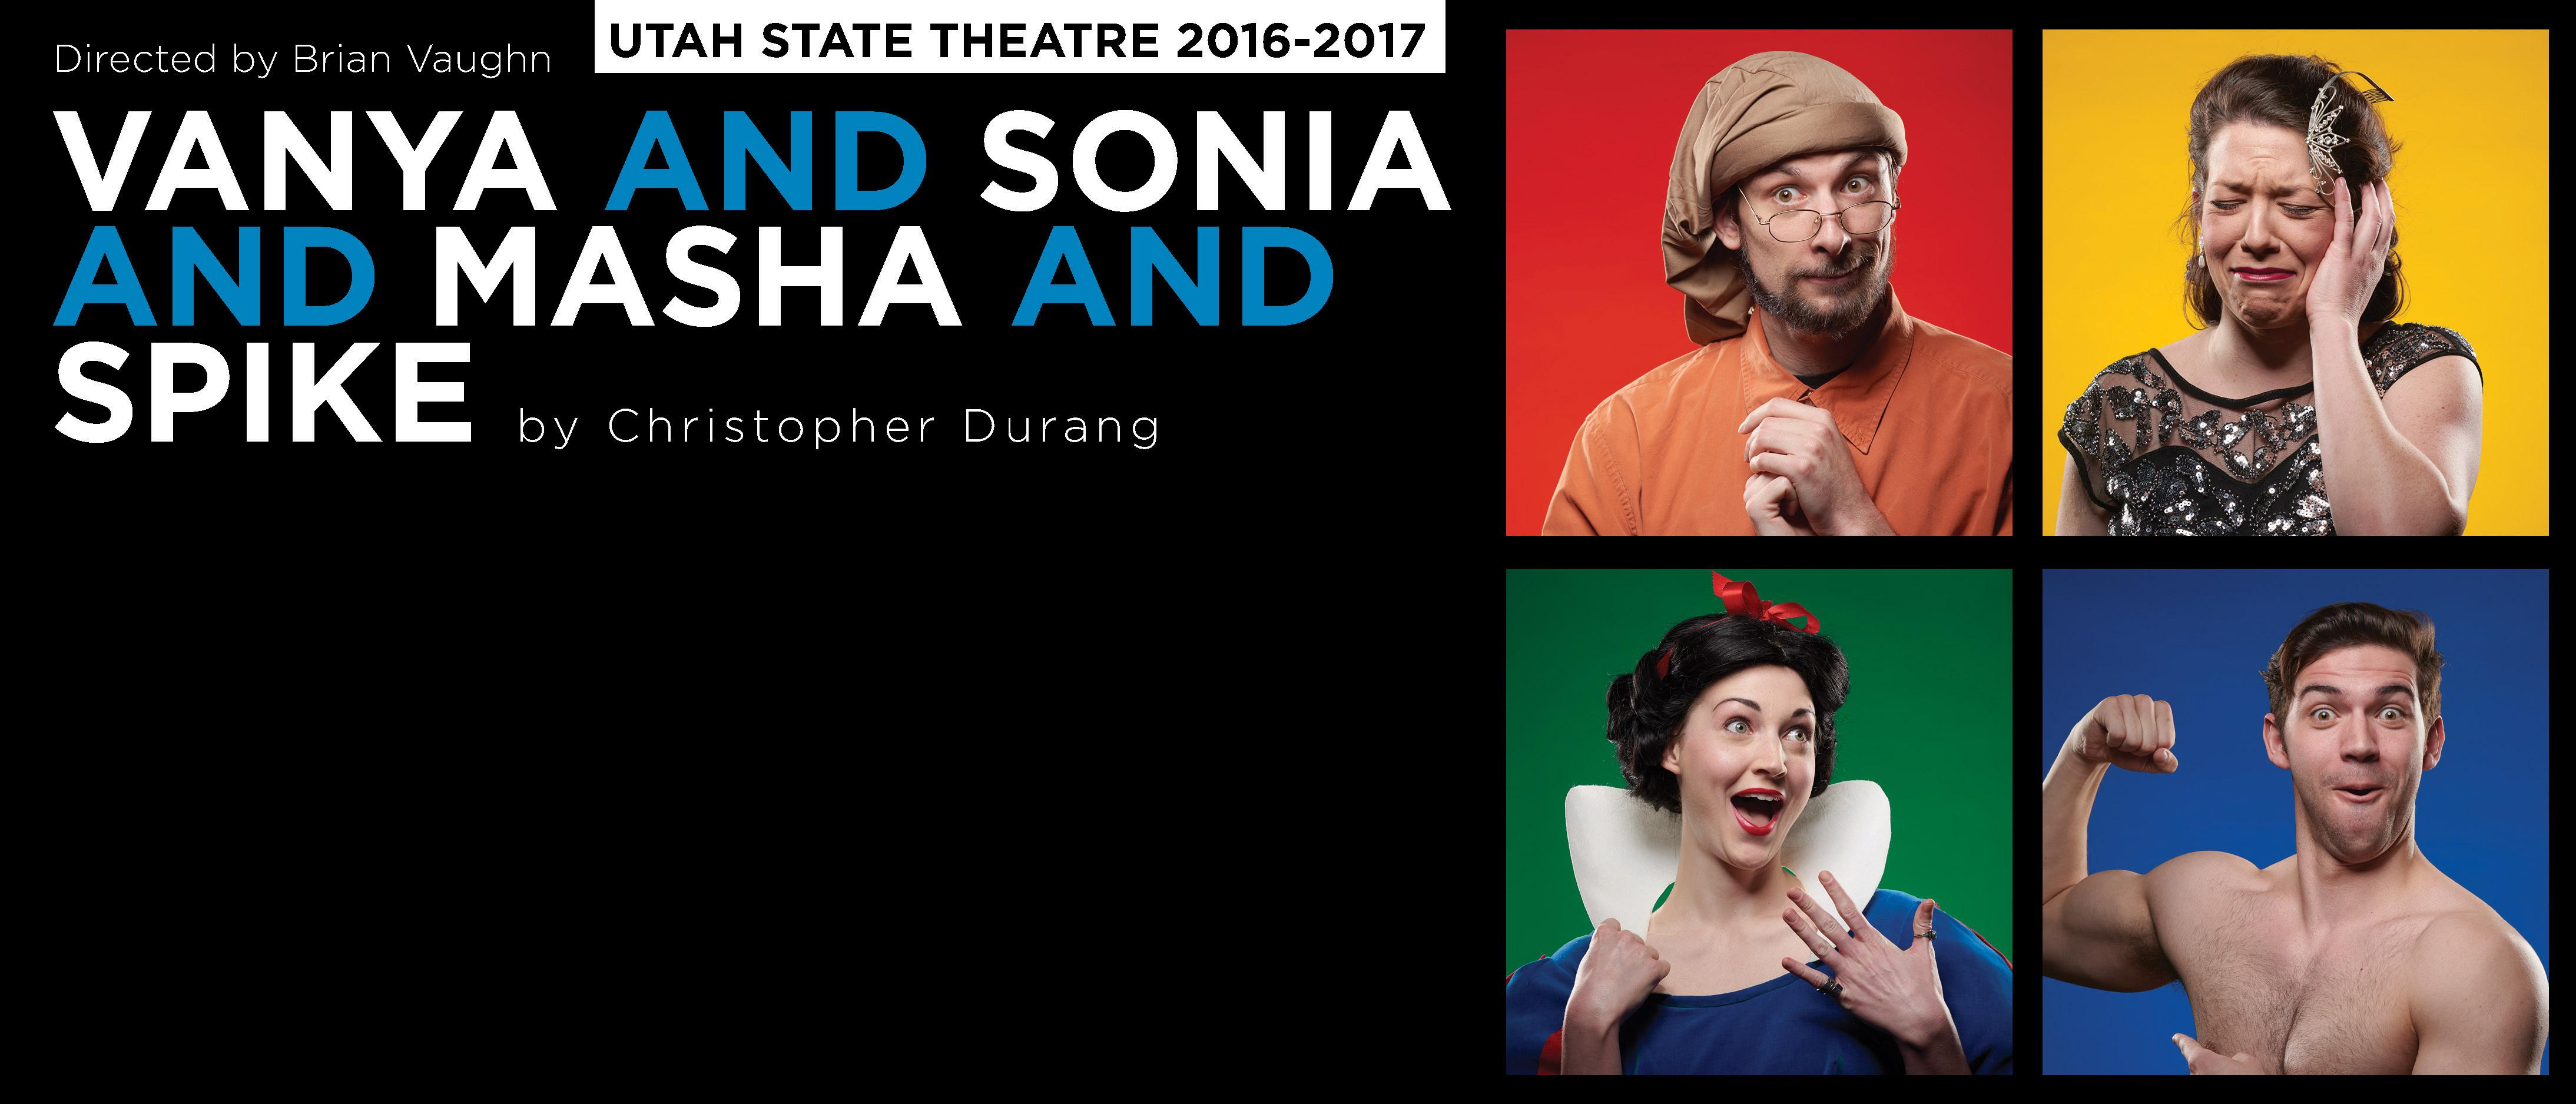 March 18, 21-25 | 7:30 p.m. | Caine Lyric Theatre | 28 West Center St. | Logan